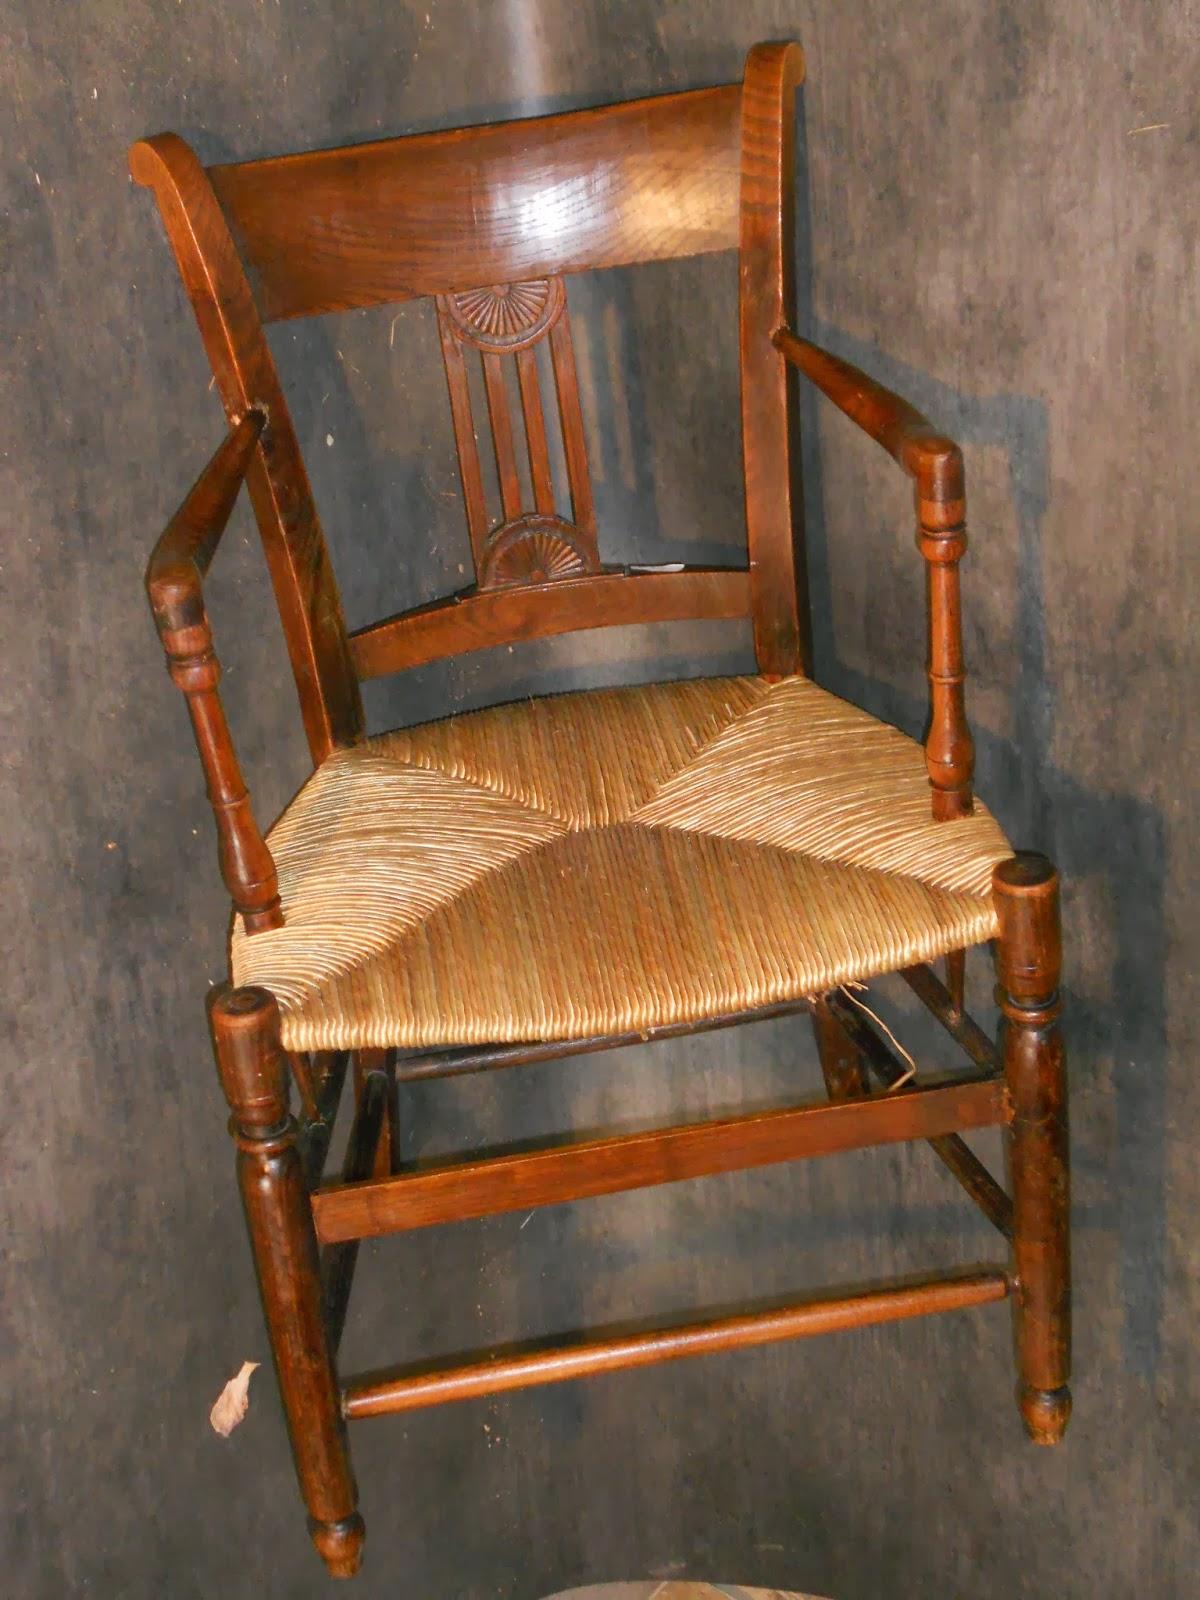 normandie cannage nos r alisations 2013. Black Bedroom Furniture Sets. Home Design Ideas